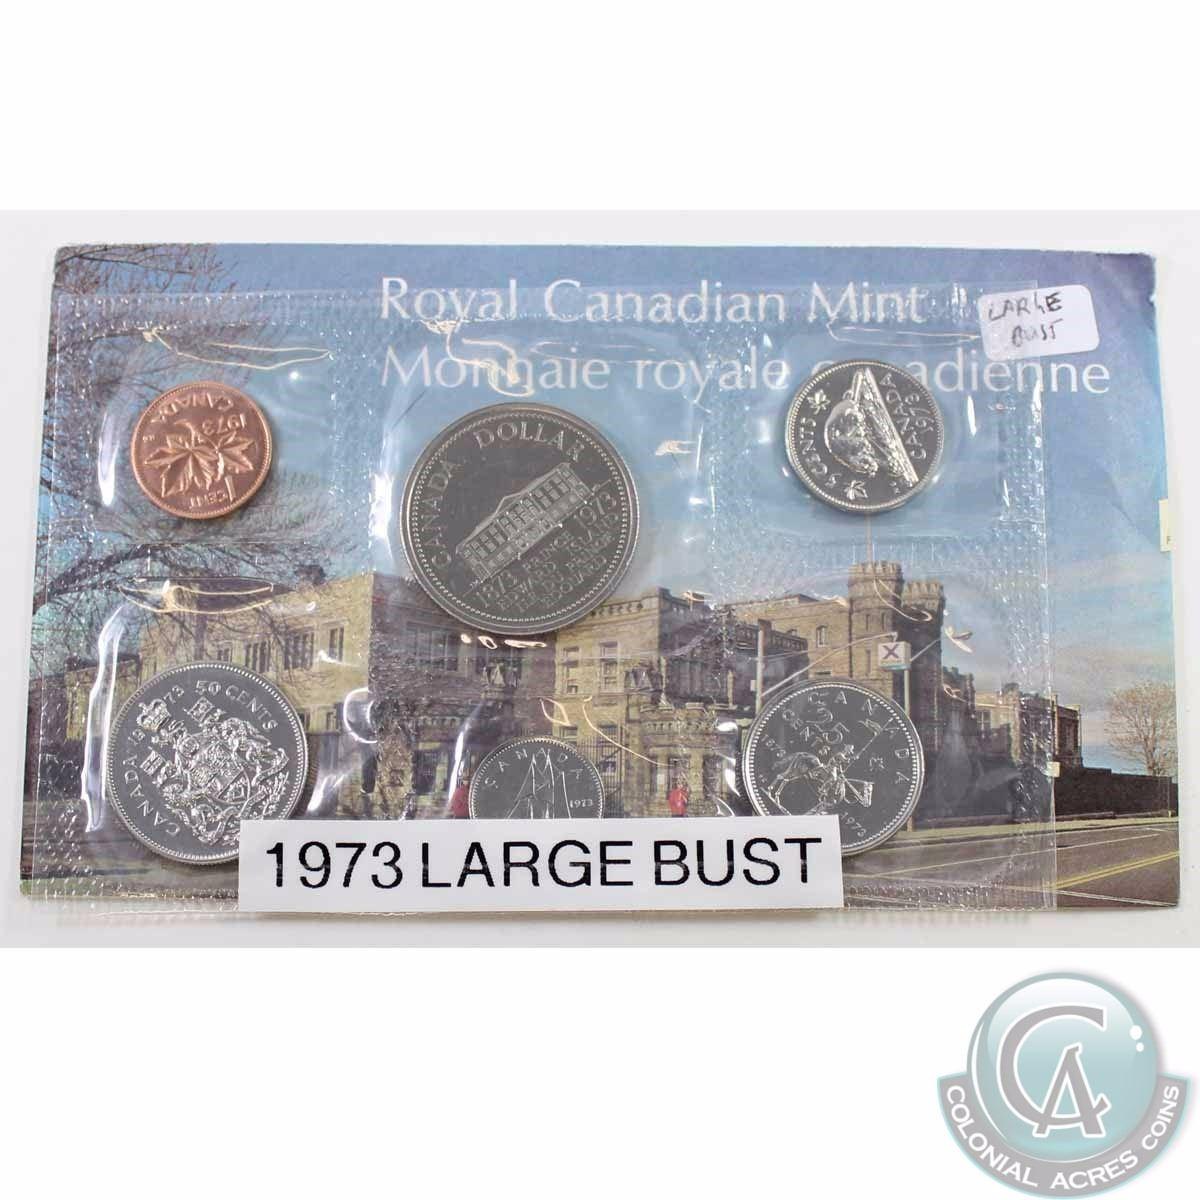 CANADA PROOF LIKE SET 1973 LARGE BUST